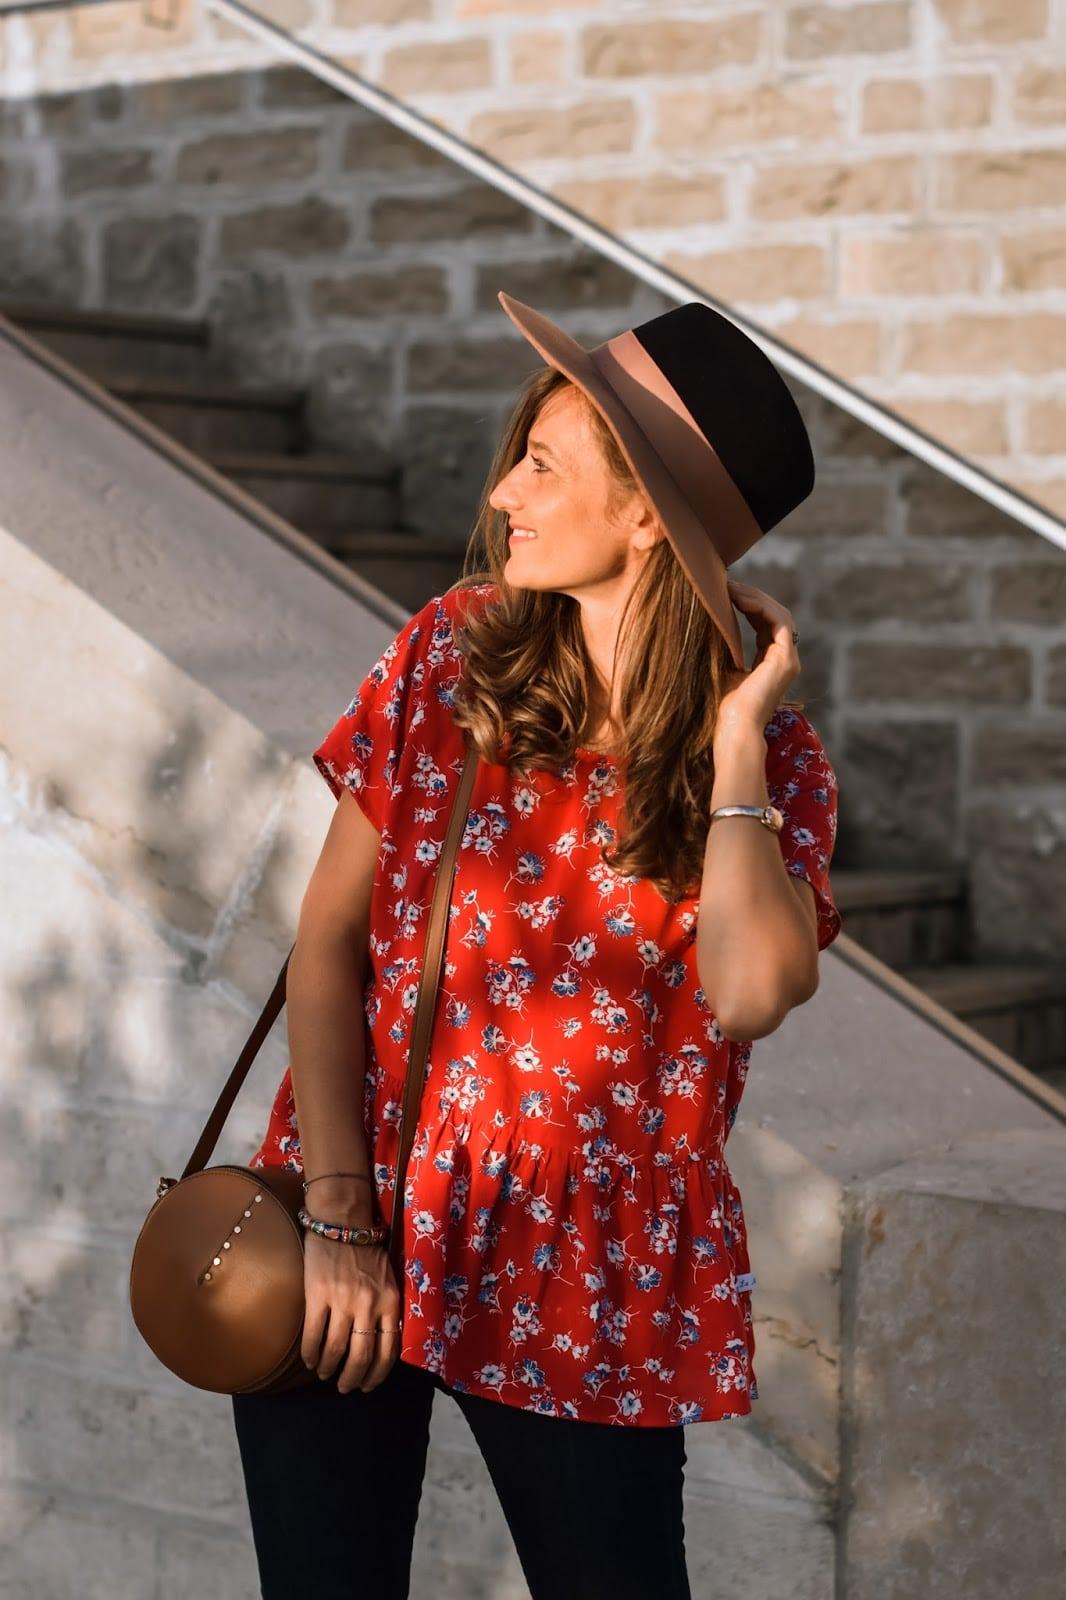 La Morue : blouse froufrou Florence